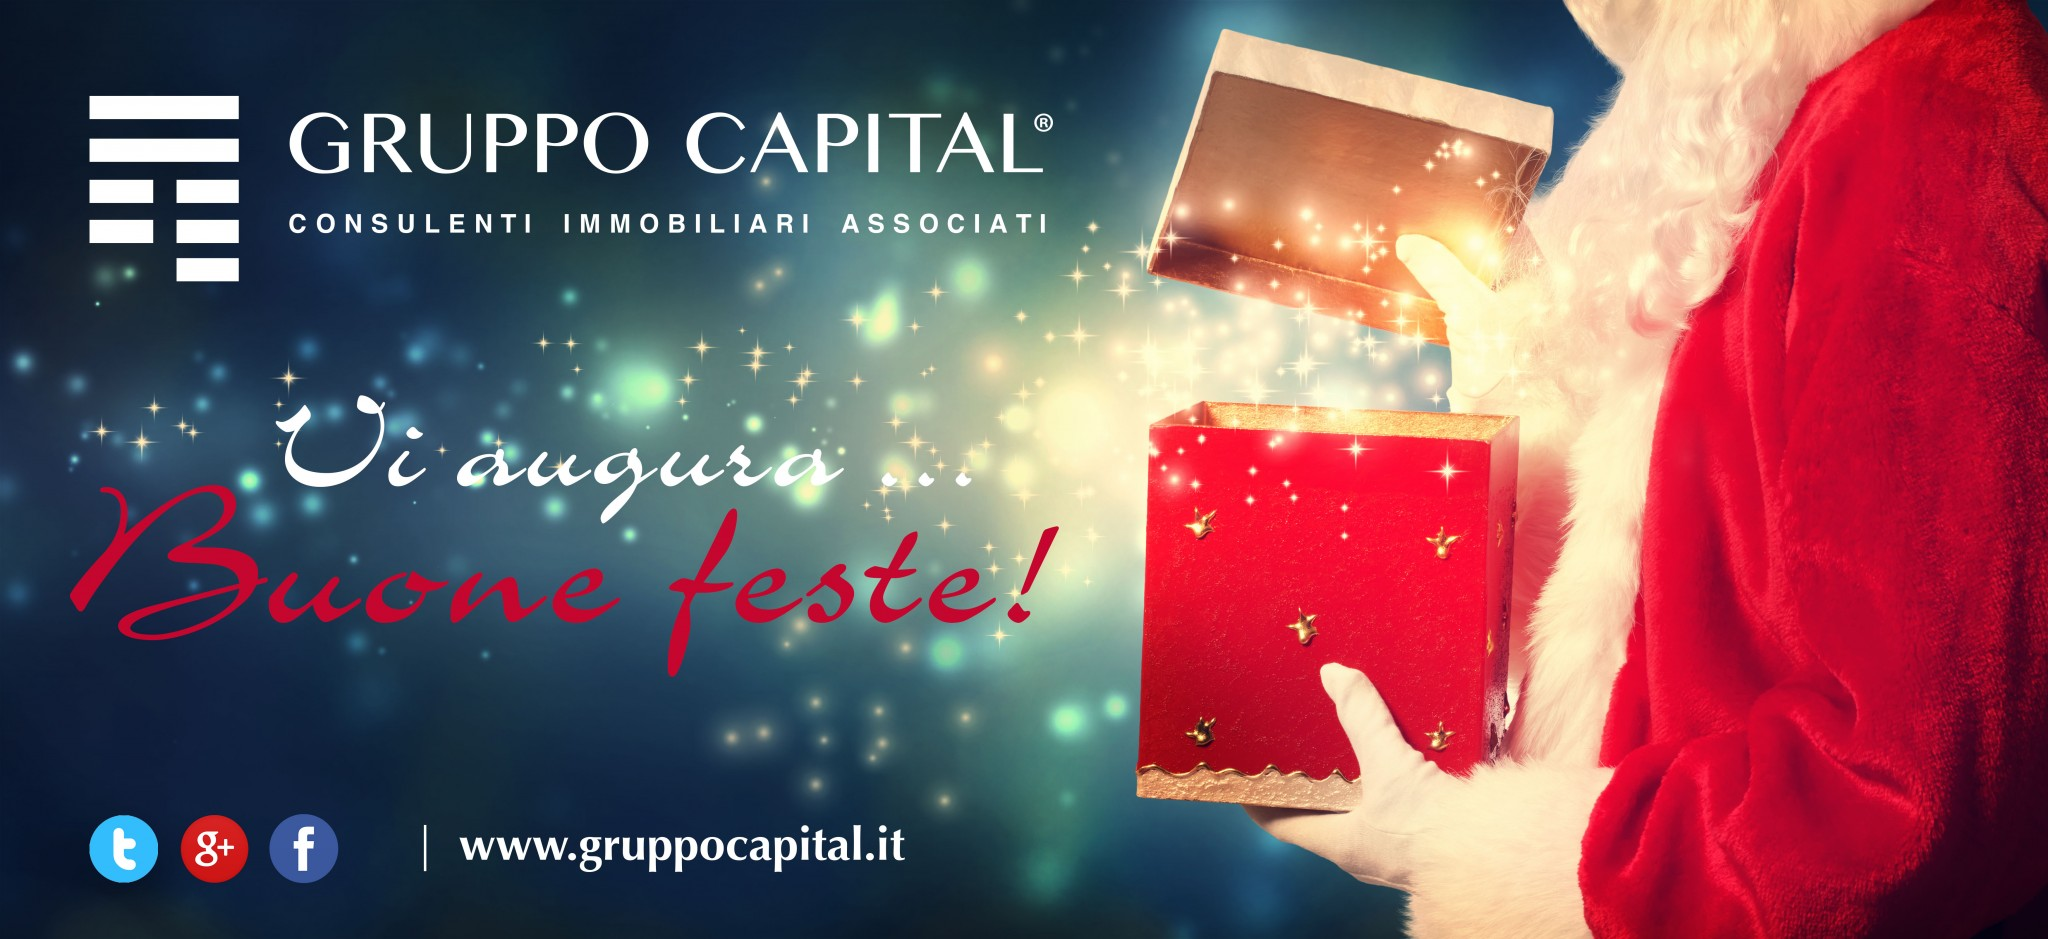 #GruppoCapital vi augura Buone Feste!